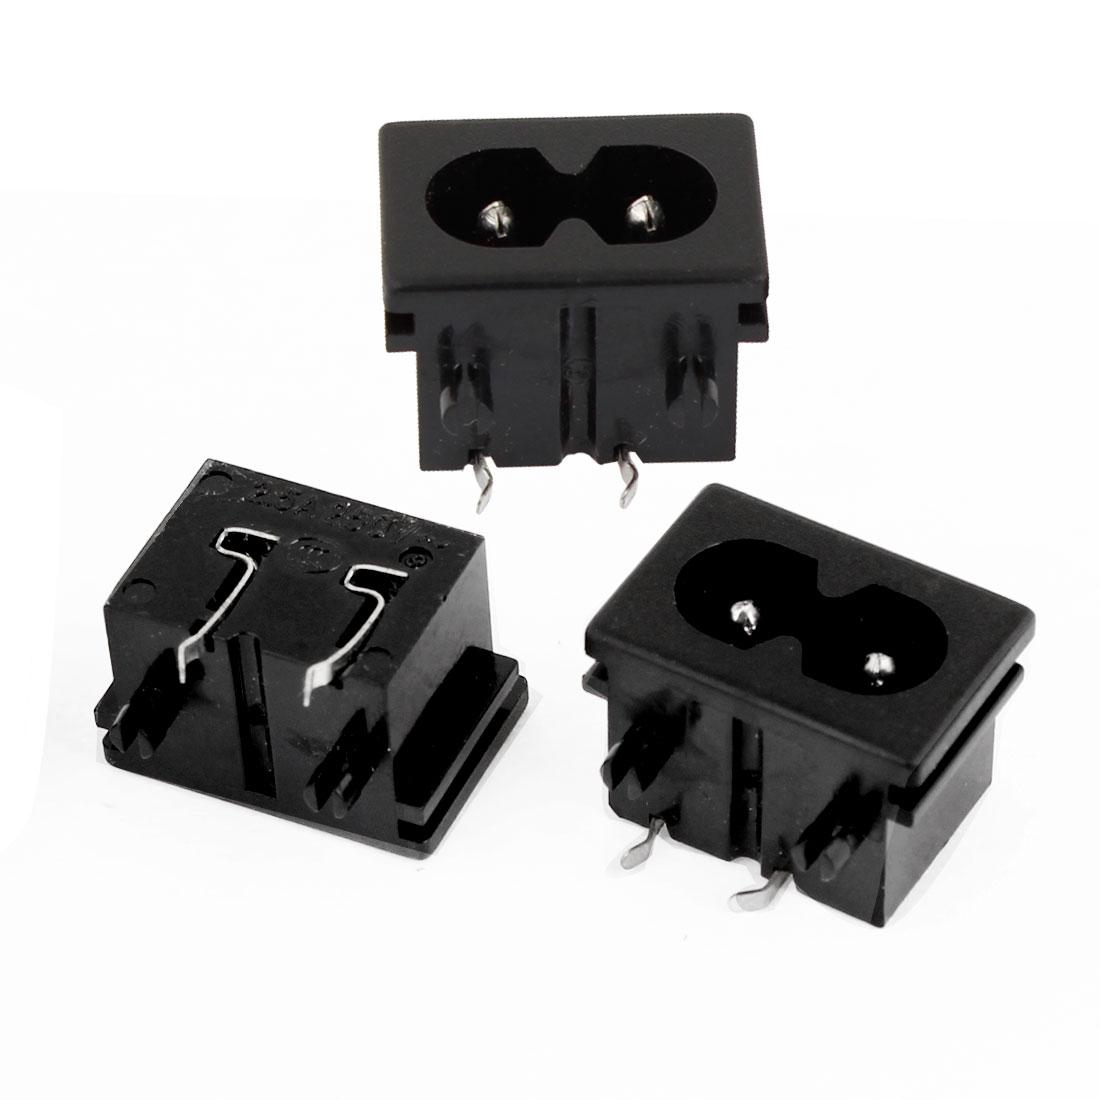 3pcs AC 250V 2.5A Panel Mount IEC320 C8 Power Inlet Socket Soldering 2-Terminal